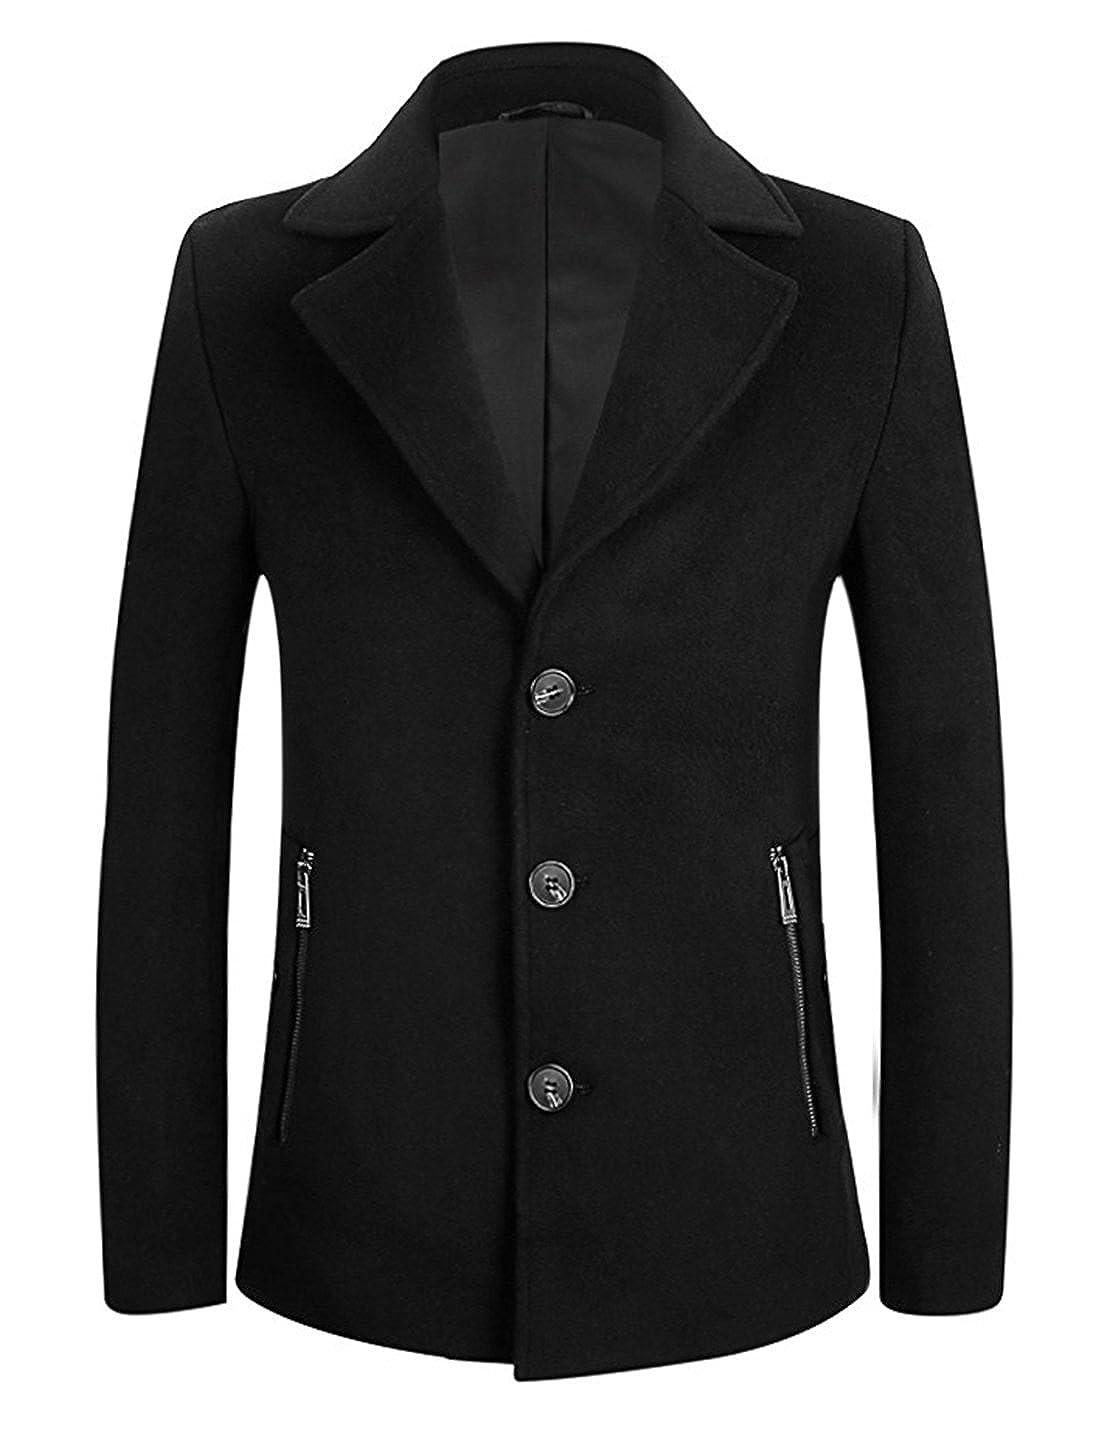 Men's Winter Quality Wool Pea Coat Slim Fit Stylish Jacket